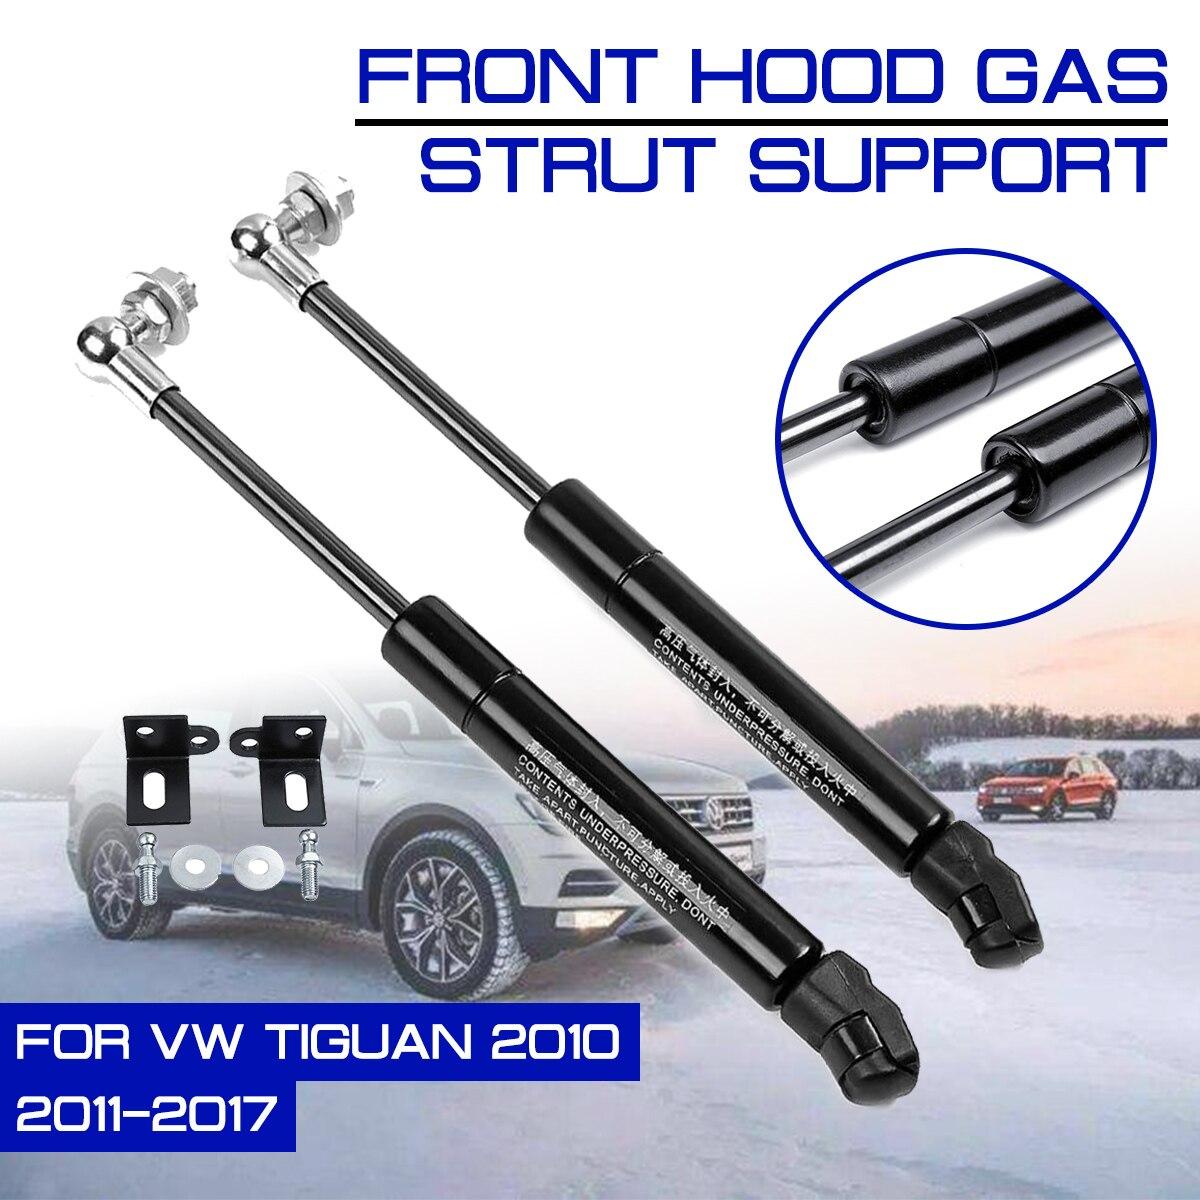 Front Engine Cover Refit Bonnet Hood For Volkswagen VW Tiguan 2010-2017 Gas Shock Lift Strut Bars Support Rod